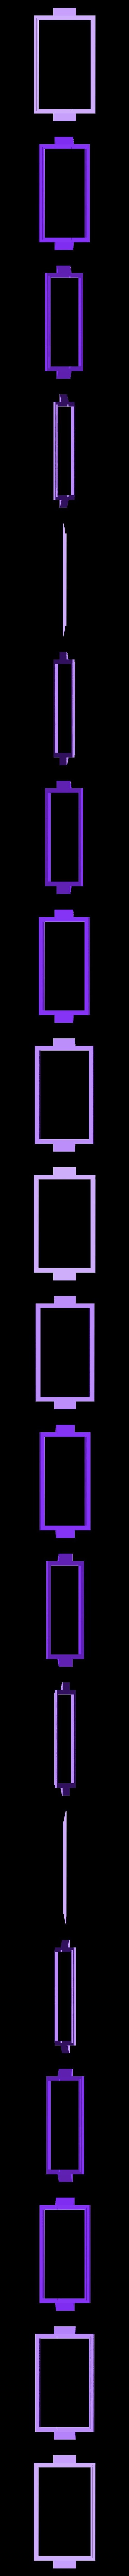 Foundation.stl Download free STL file HO Scale Big Red Barn • 3D printer template, kabrumble